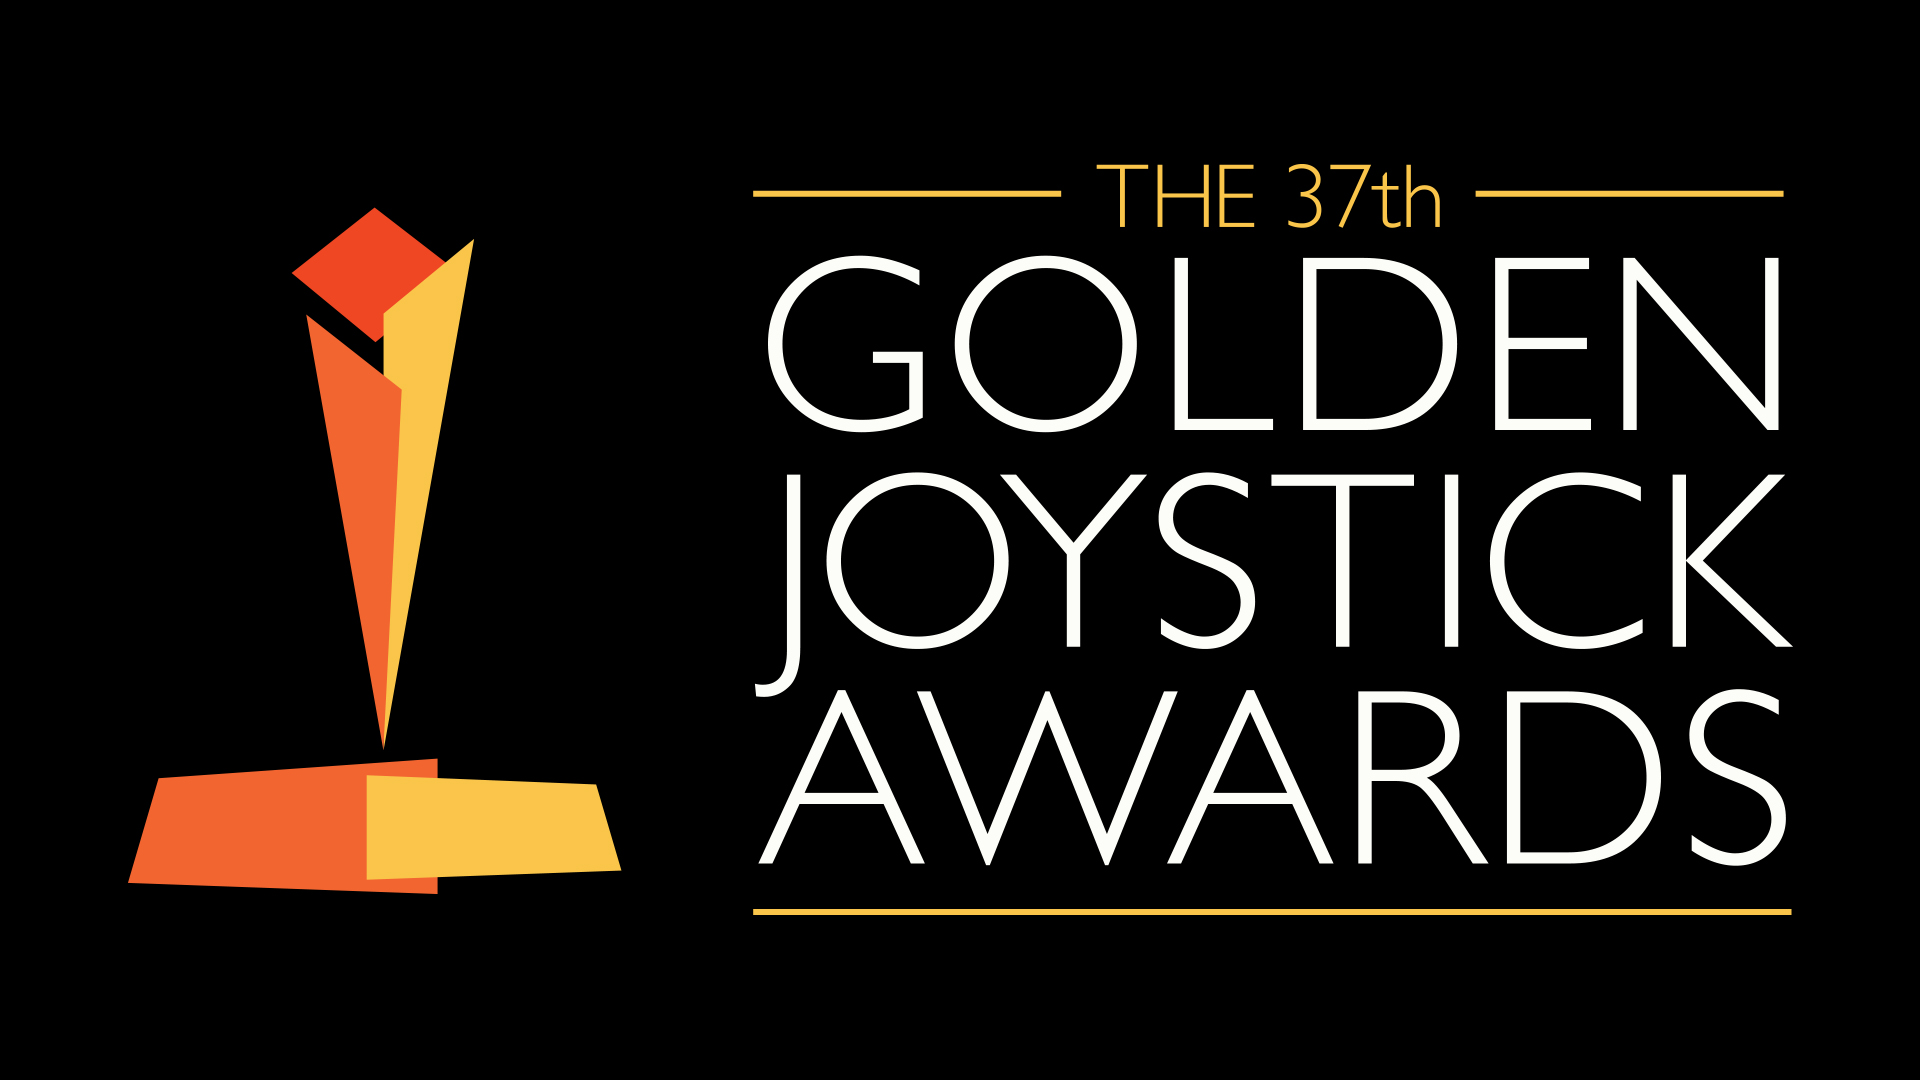 golden_joystick_awards_2019.jpg